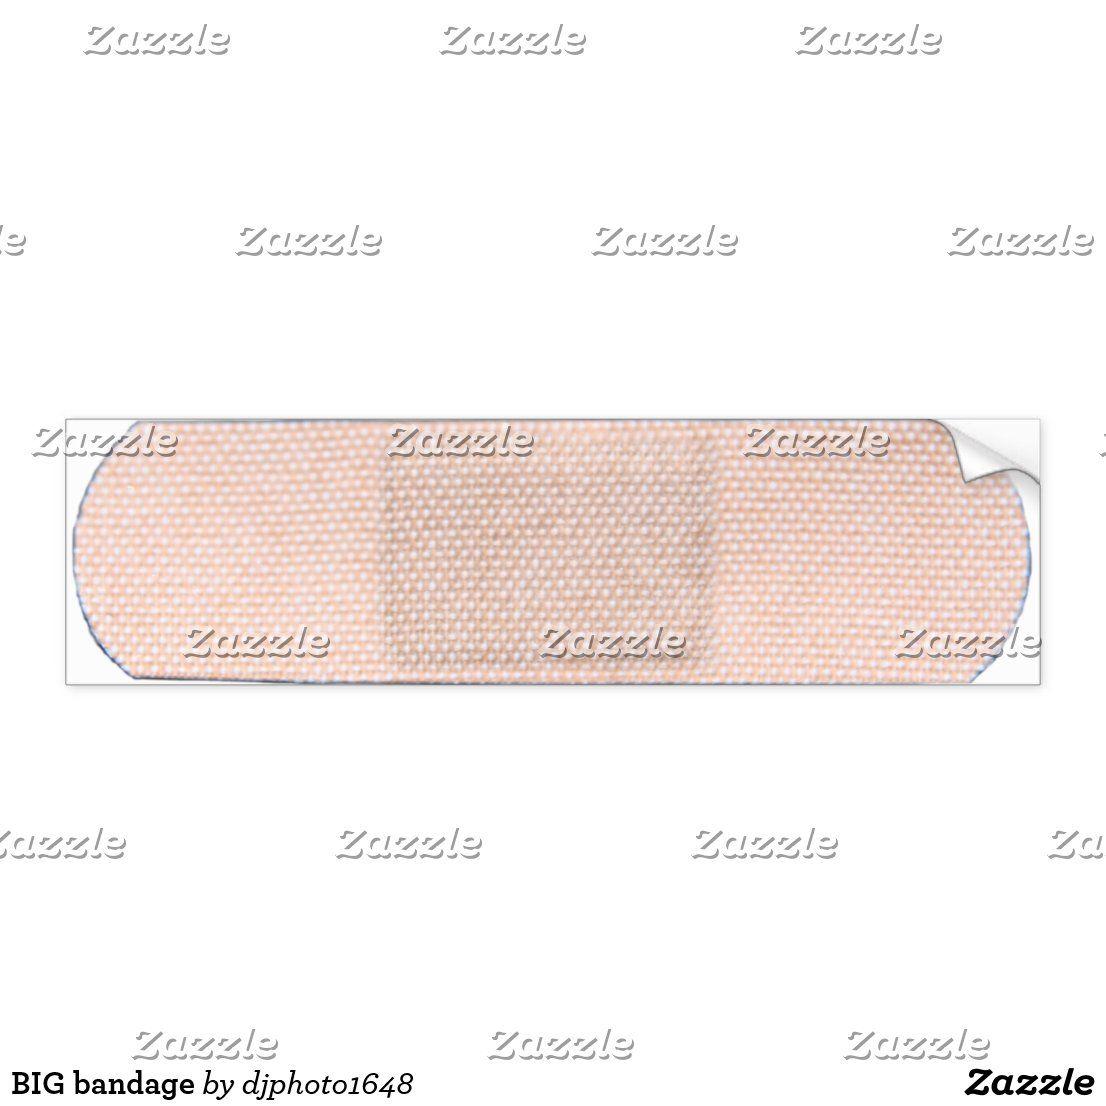 Big Bandage Bumper Sticker Zazzle Com Bumper Stickers Bumpers Strong Adhesive [ 1106 x 1106 Pixel ]